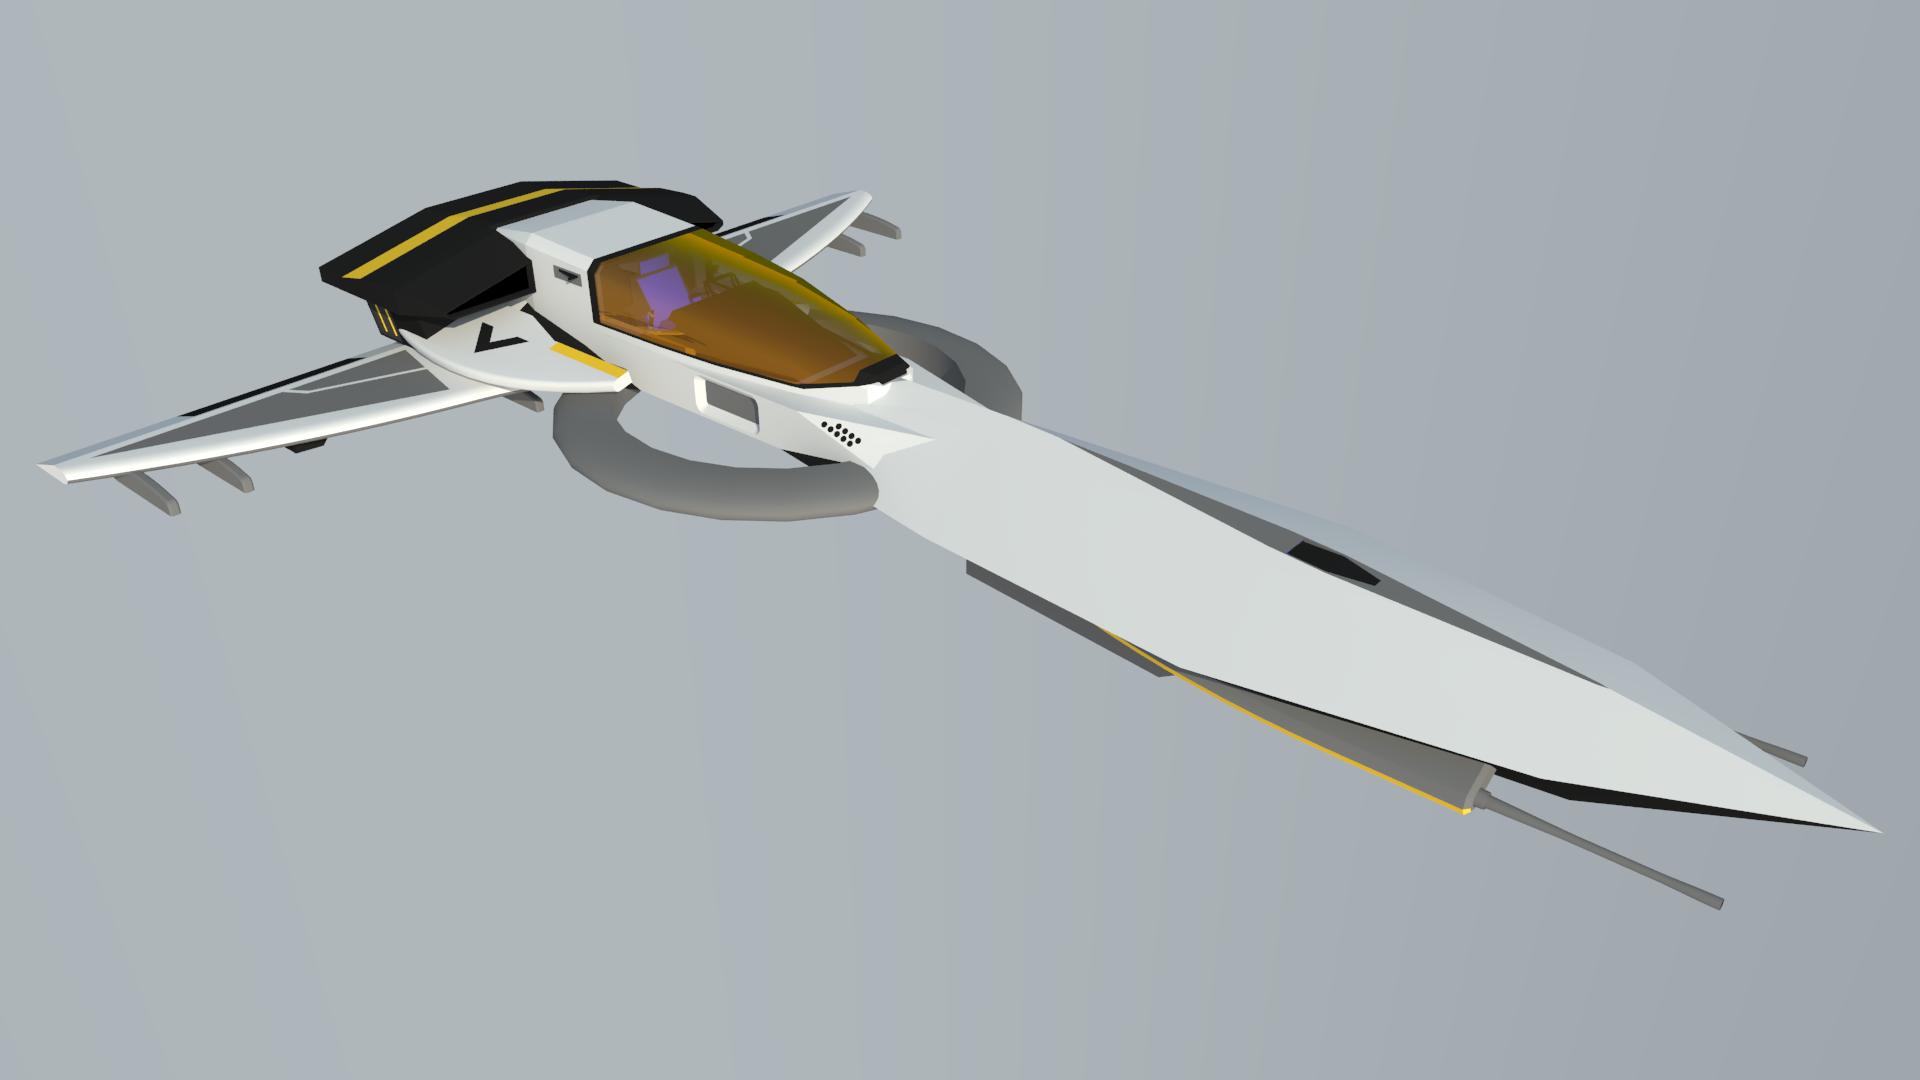 Hurricane Class Interceptor by Gwentari